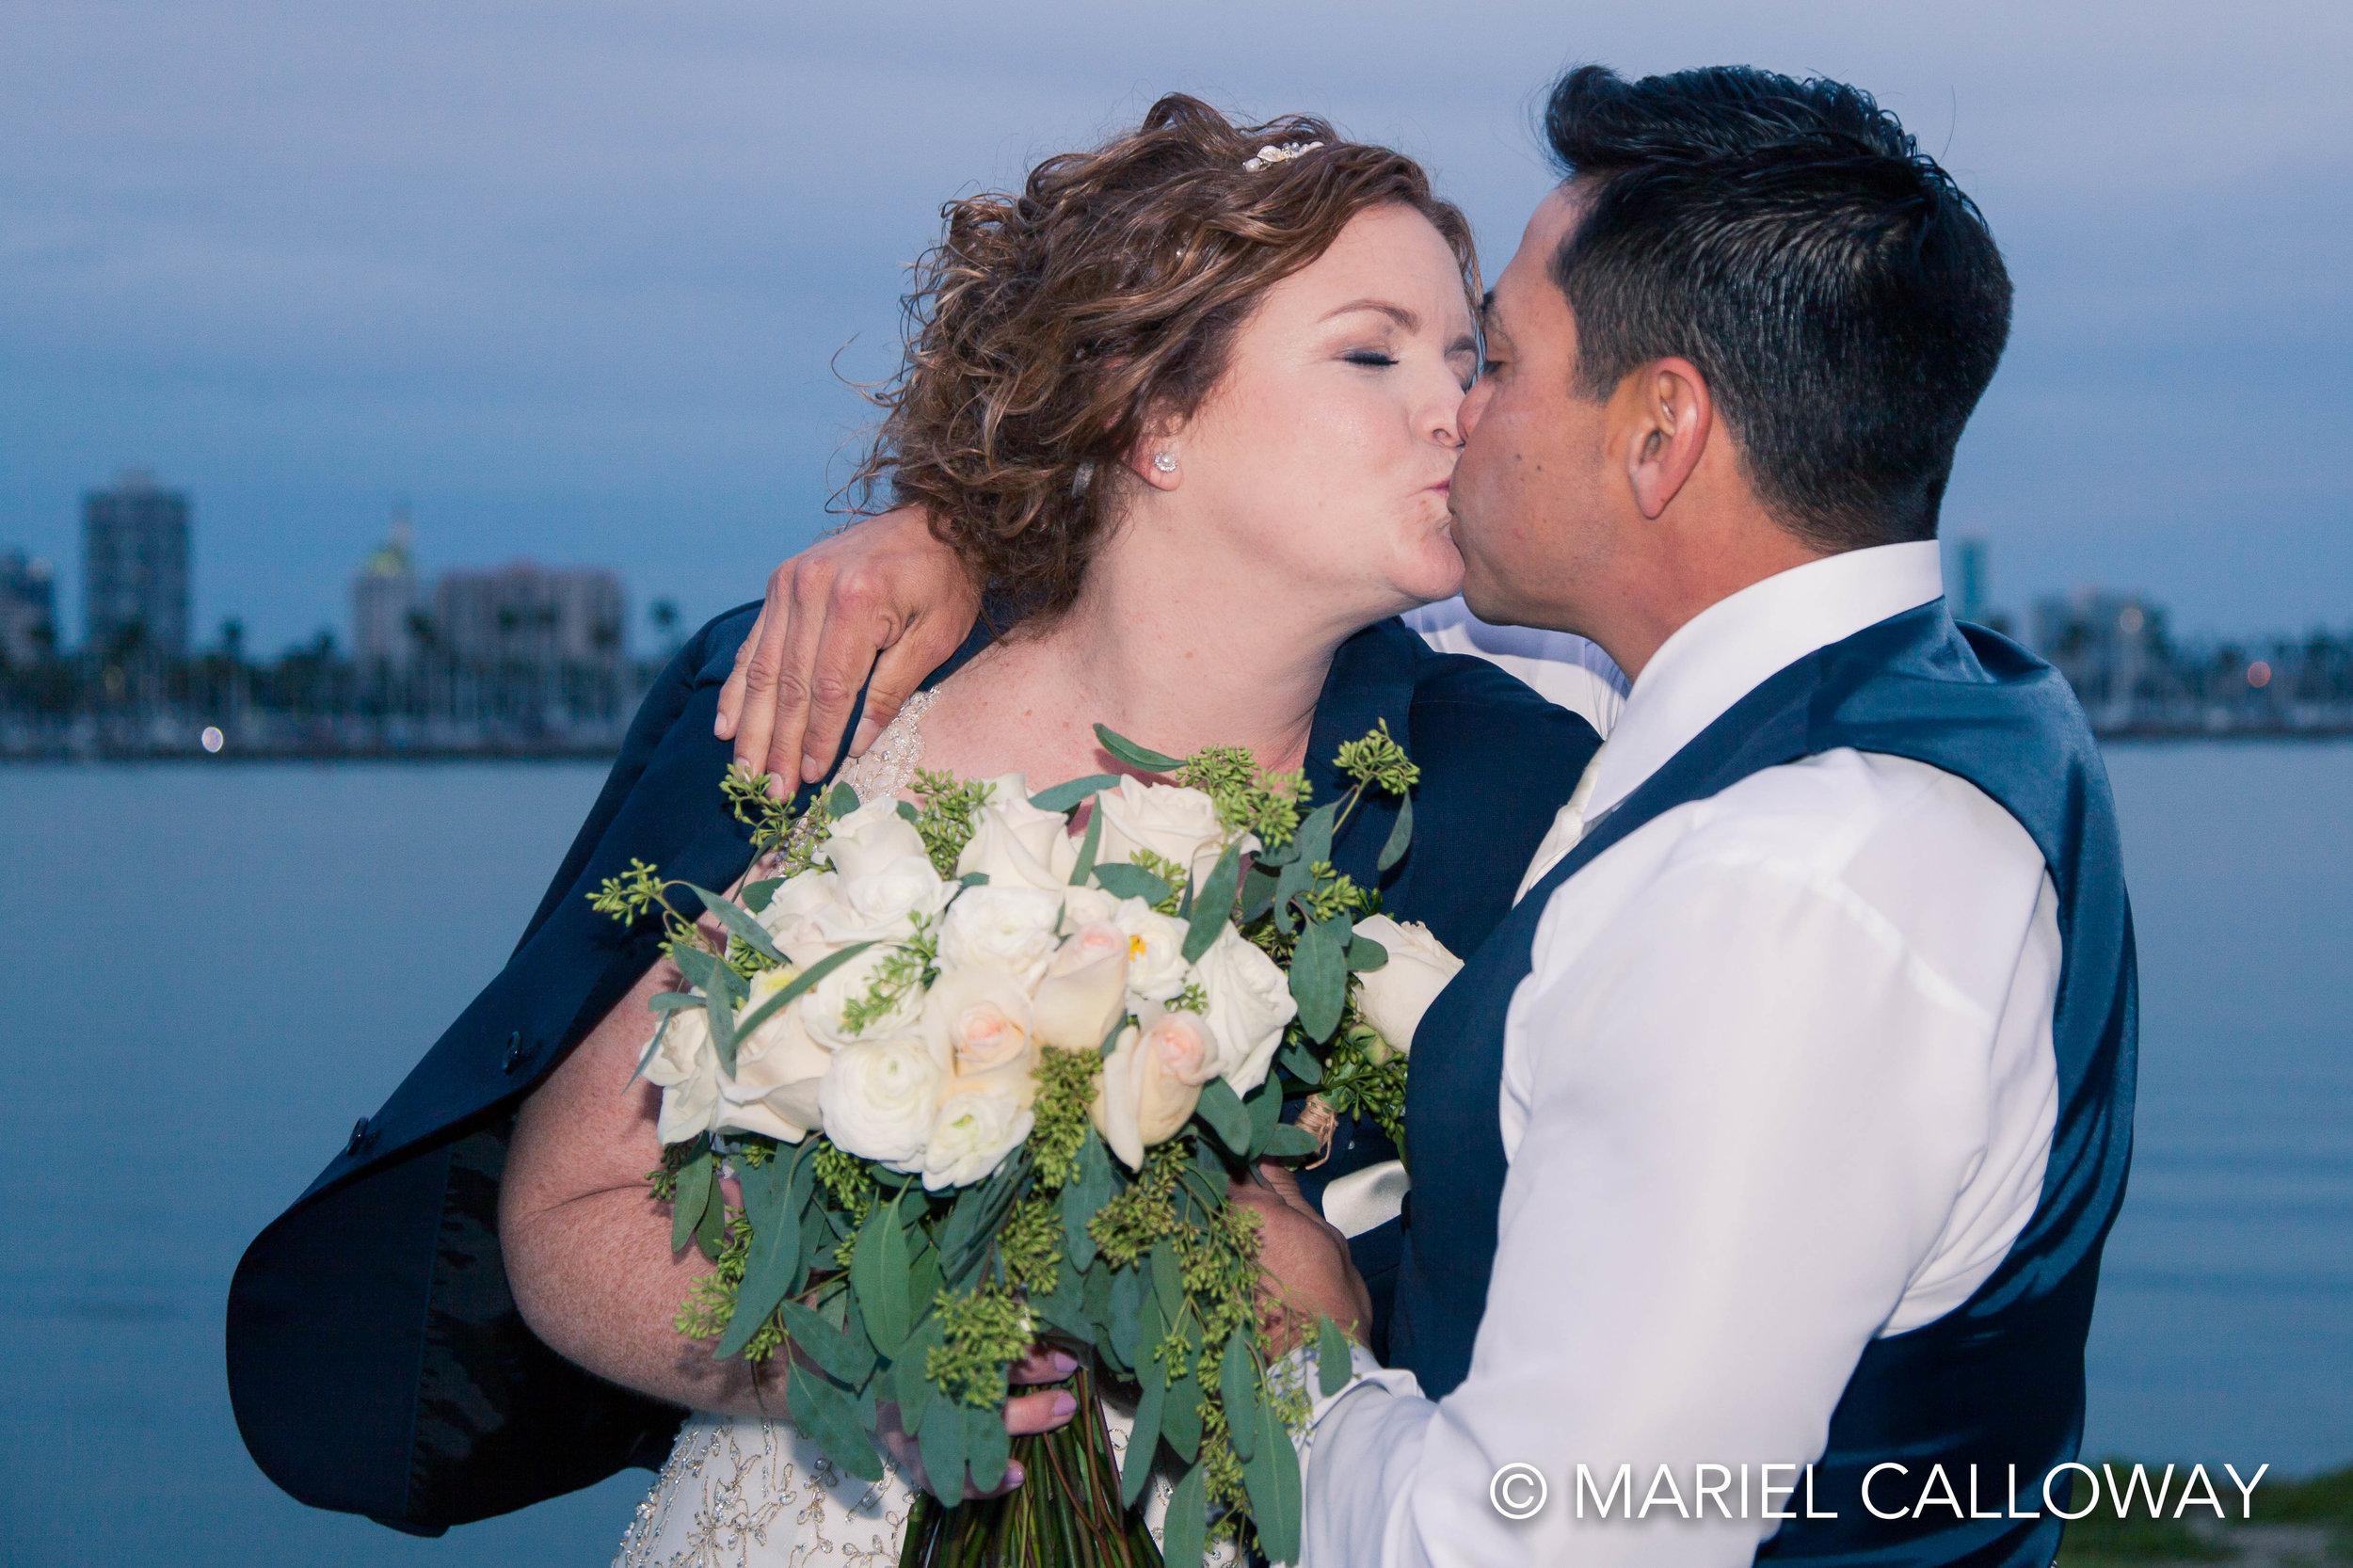 Mariel-Calloway-Los-Angeles-Wedding-Photography-Carmona-27.jpg